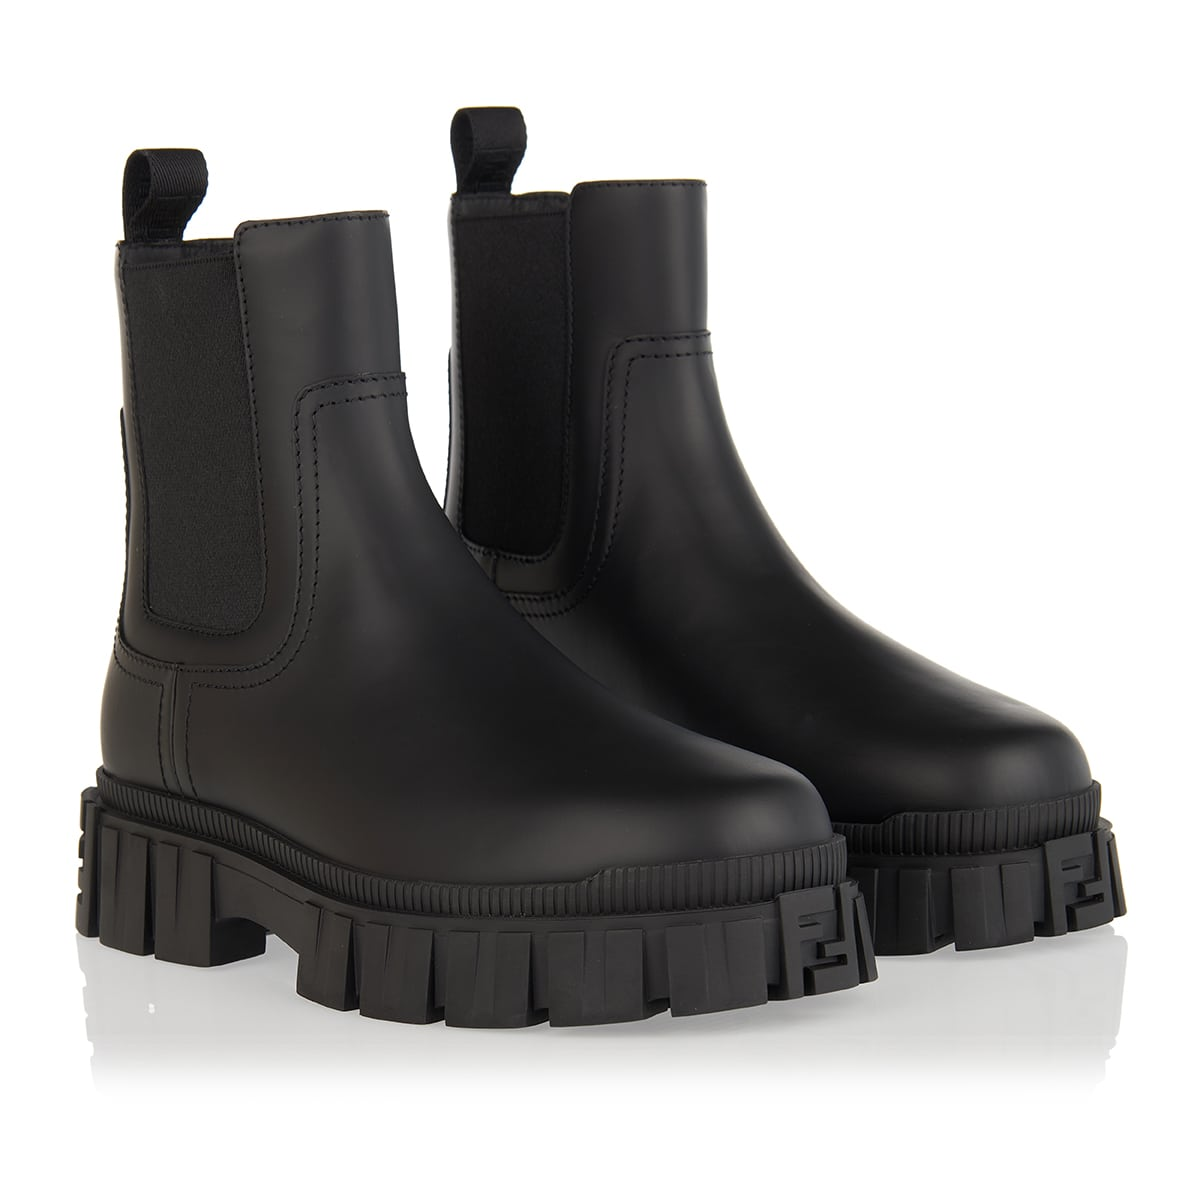 Fendi Force leather Chelsea boots